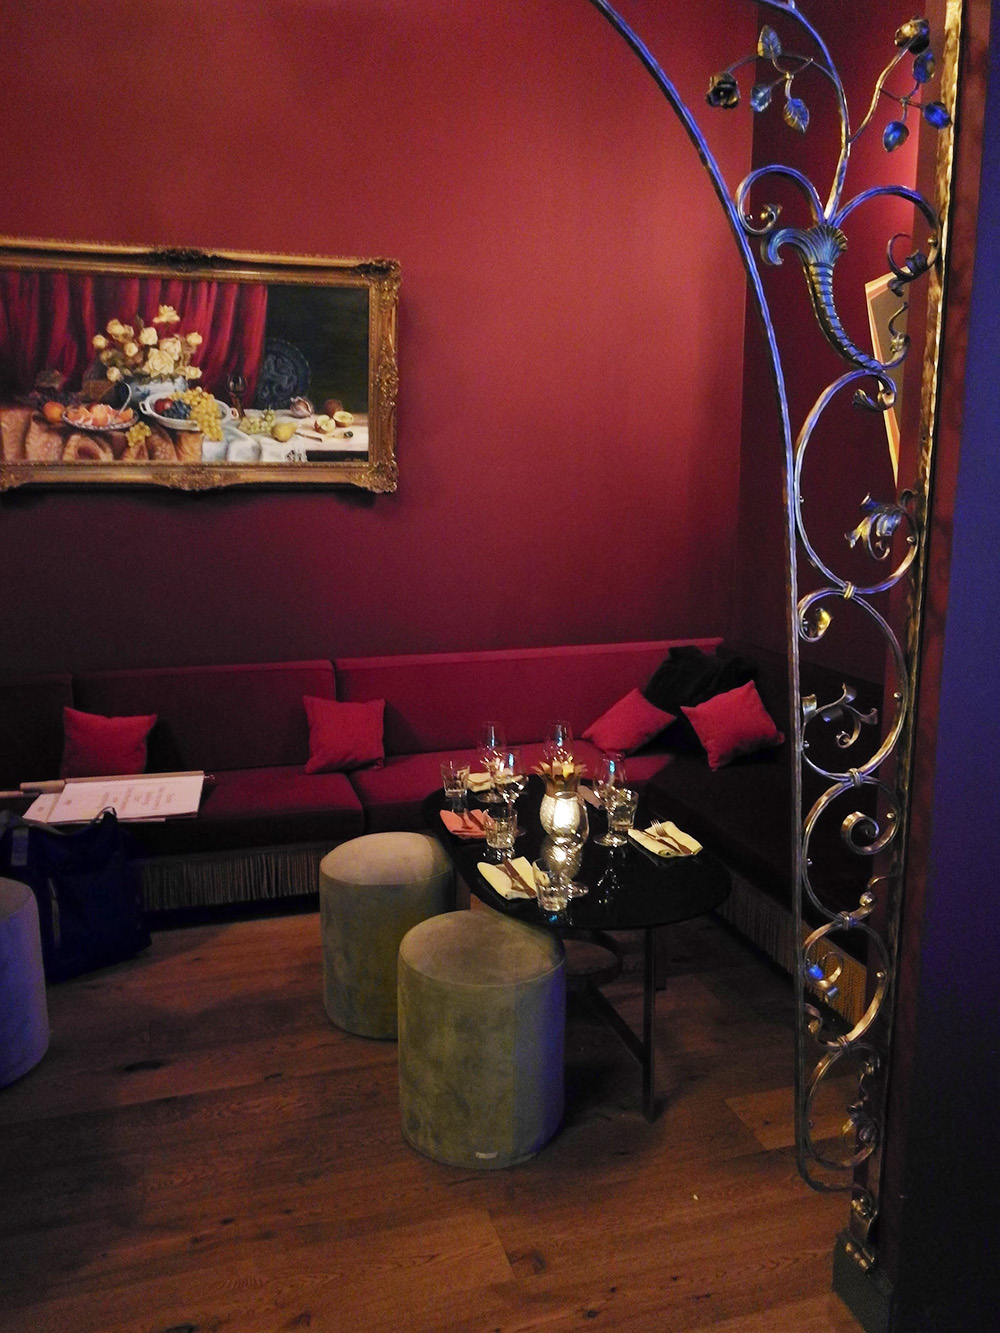 Hoteltipp München 25hours Hotel The Royal Bavarian Séparéé im Neni Restaurant